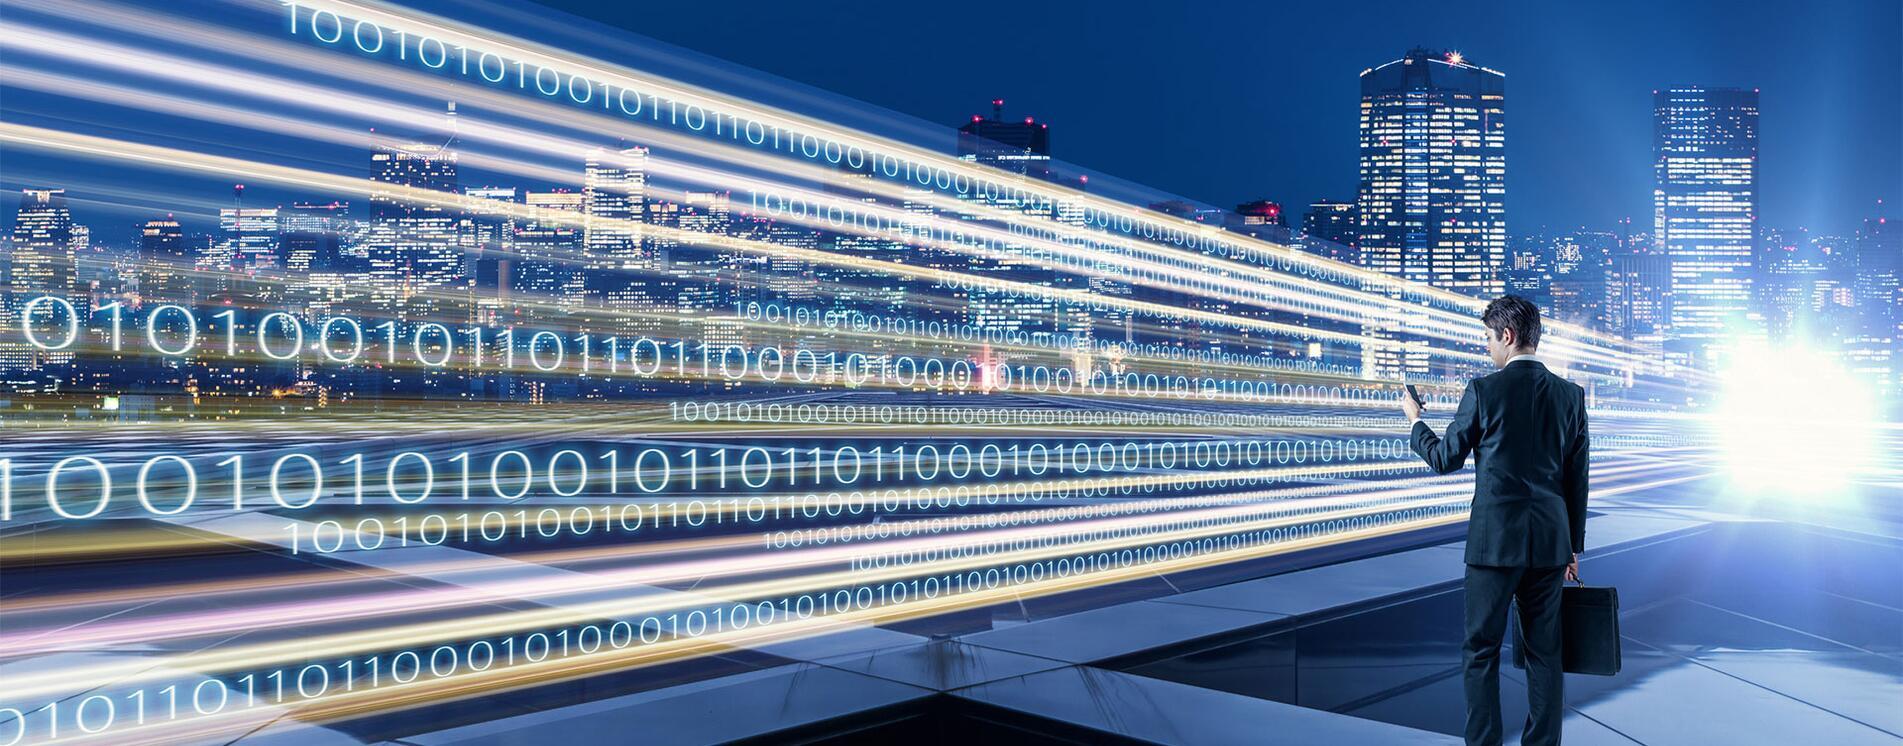 The Digital Revolution Demands New Thinking When